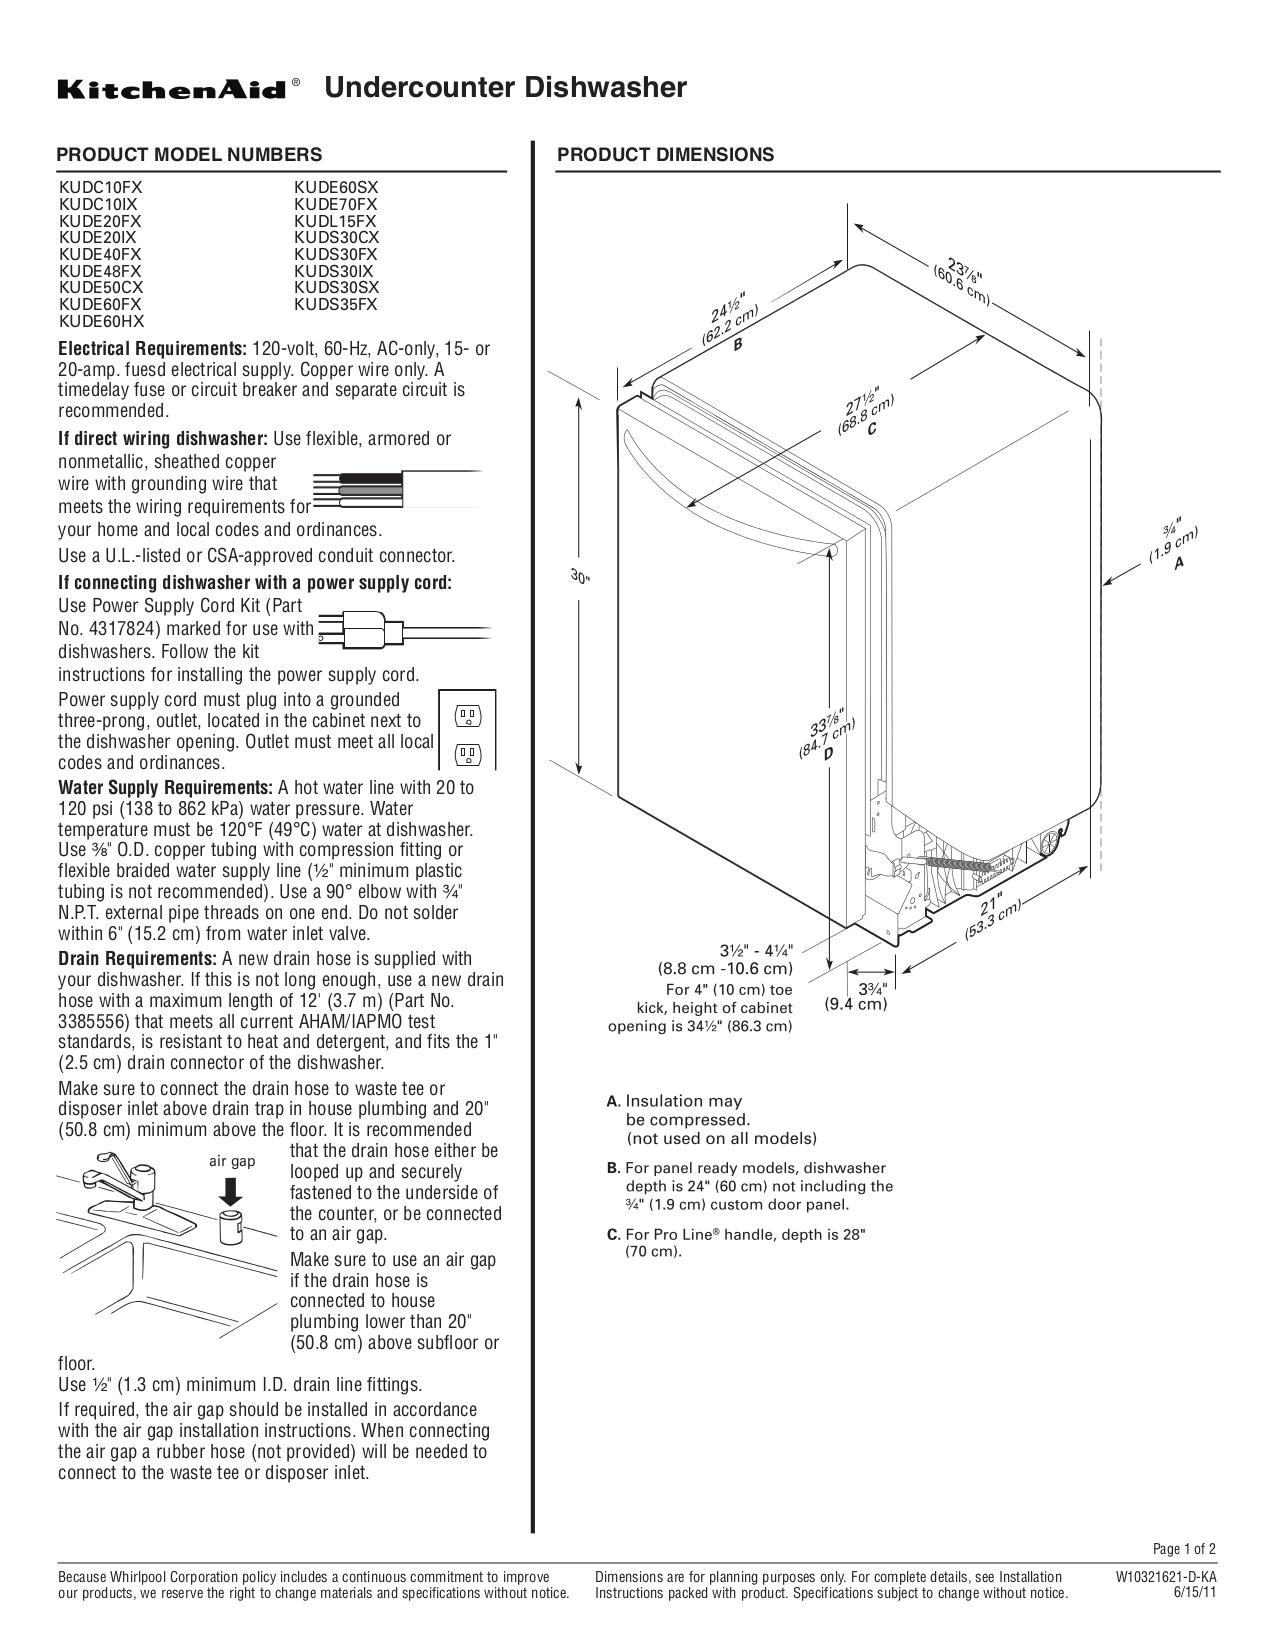 Kitchenaid Dishwasher Manual Reset